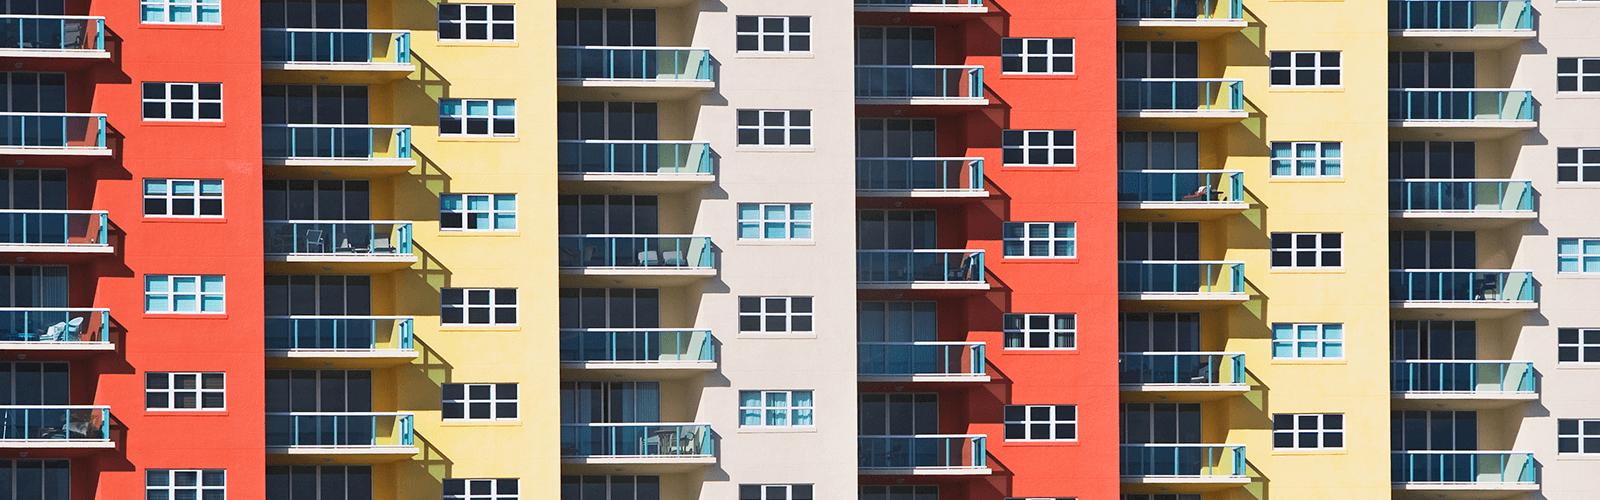 A multicolor apartment building with outdoor decks.